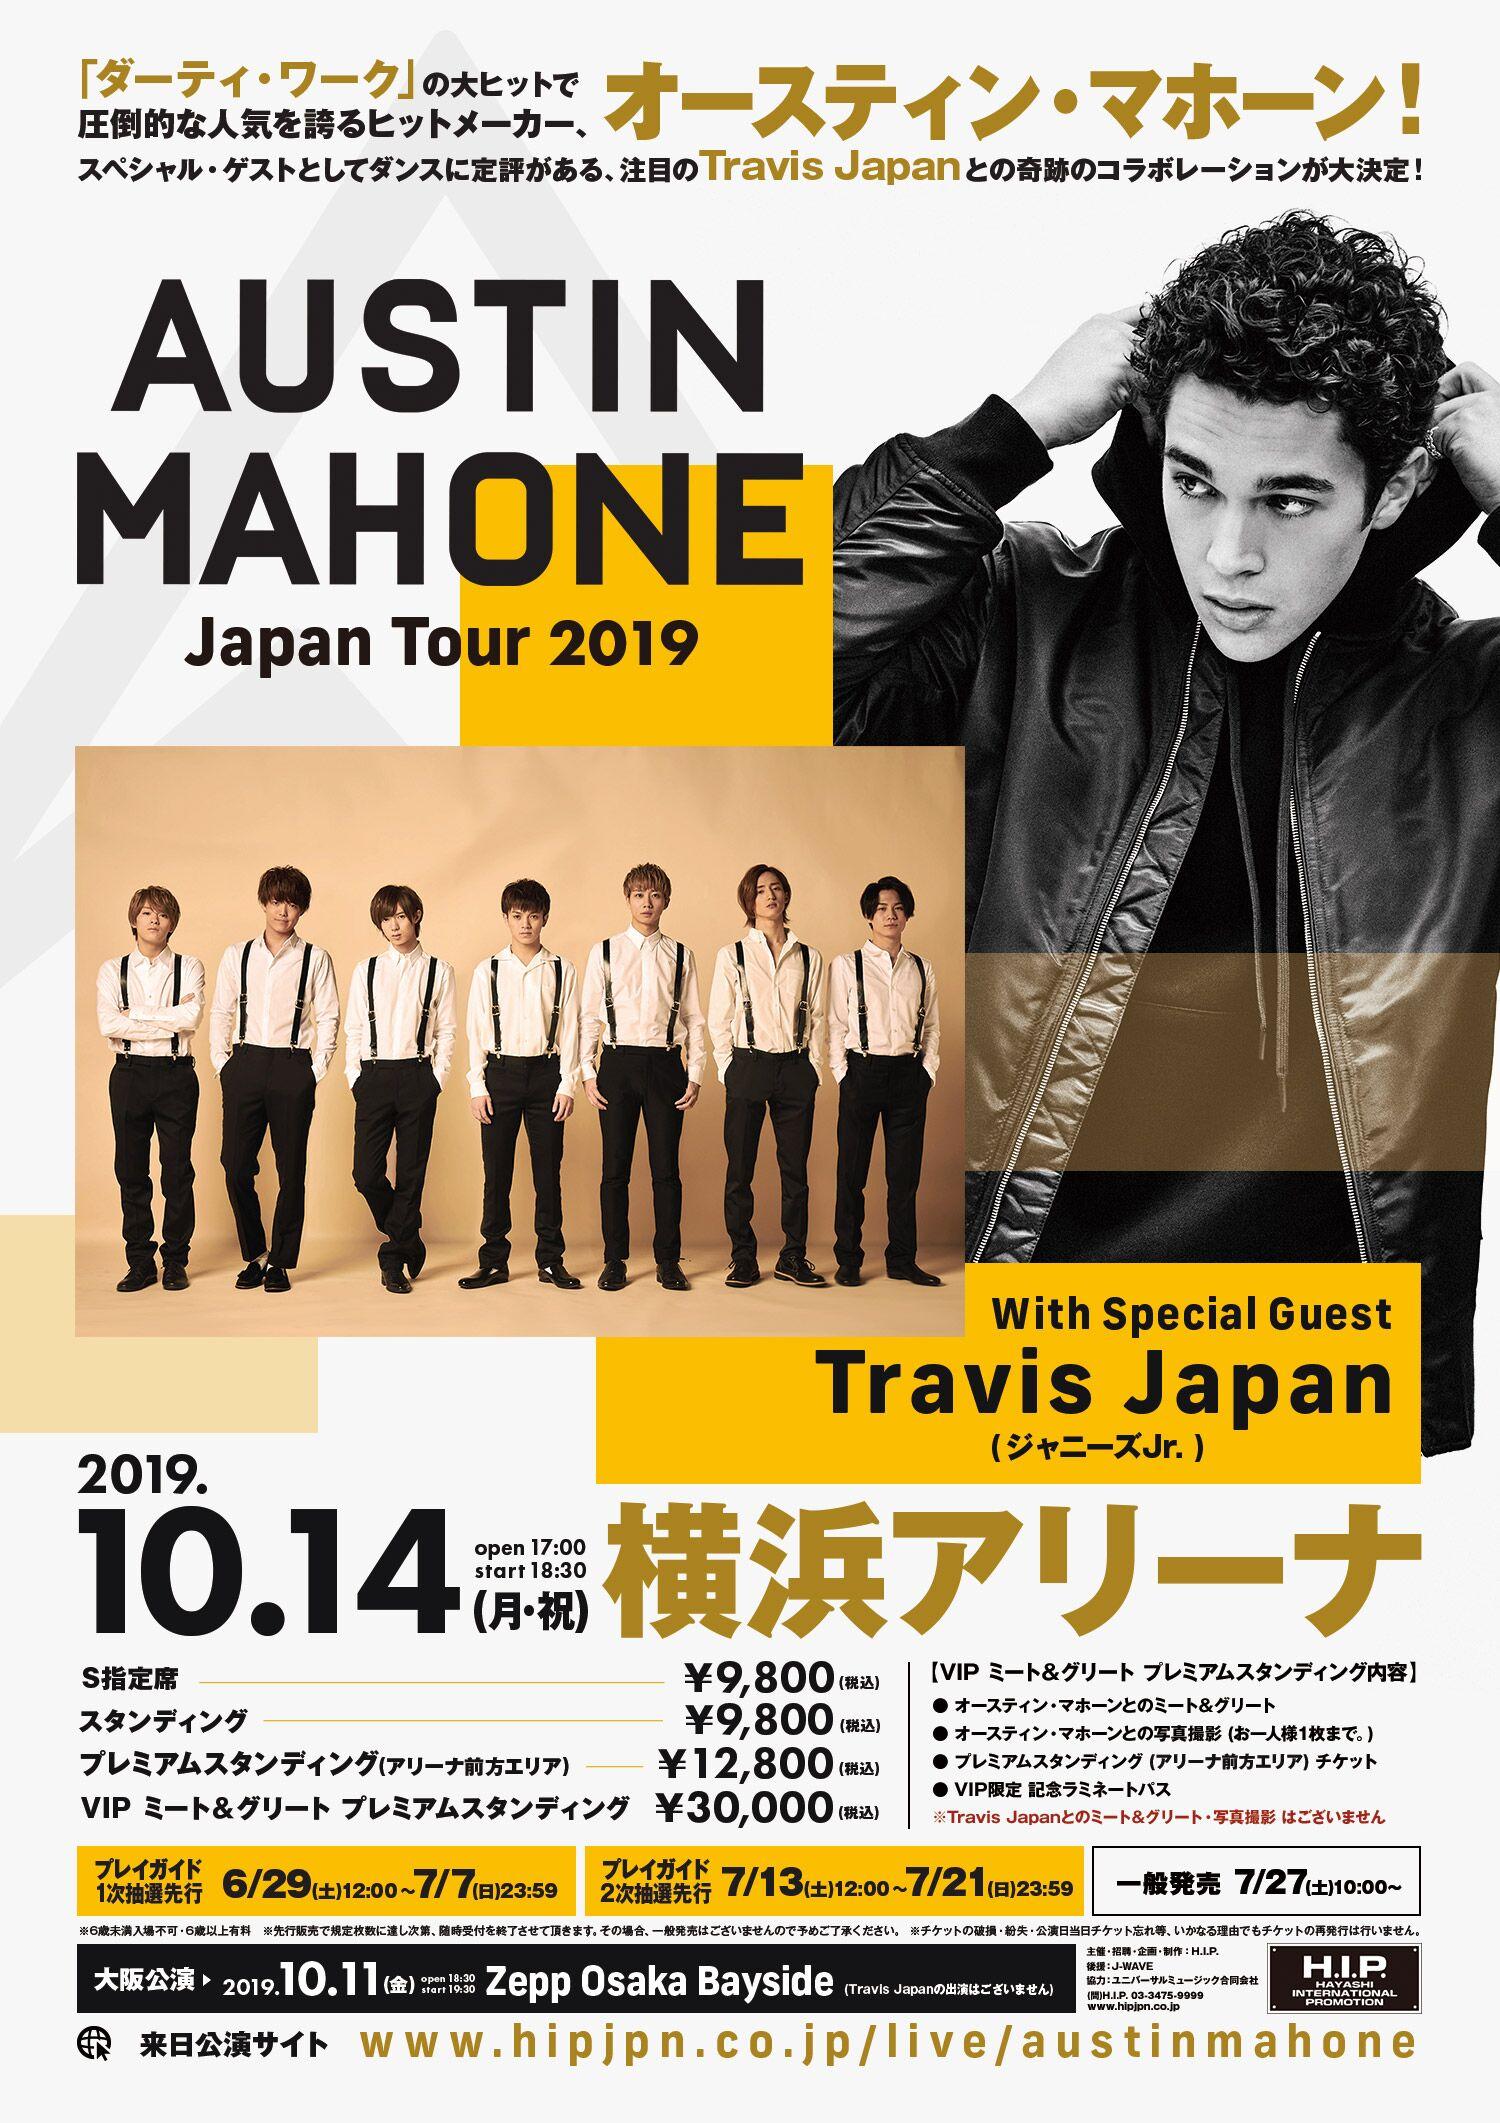 Austin Mahone Japan Tour 2019